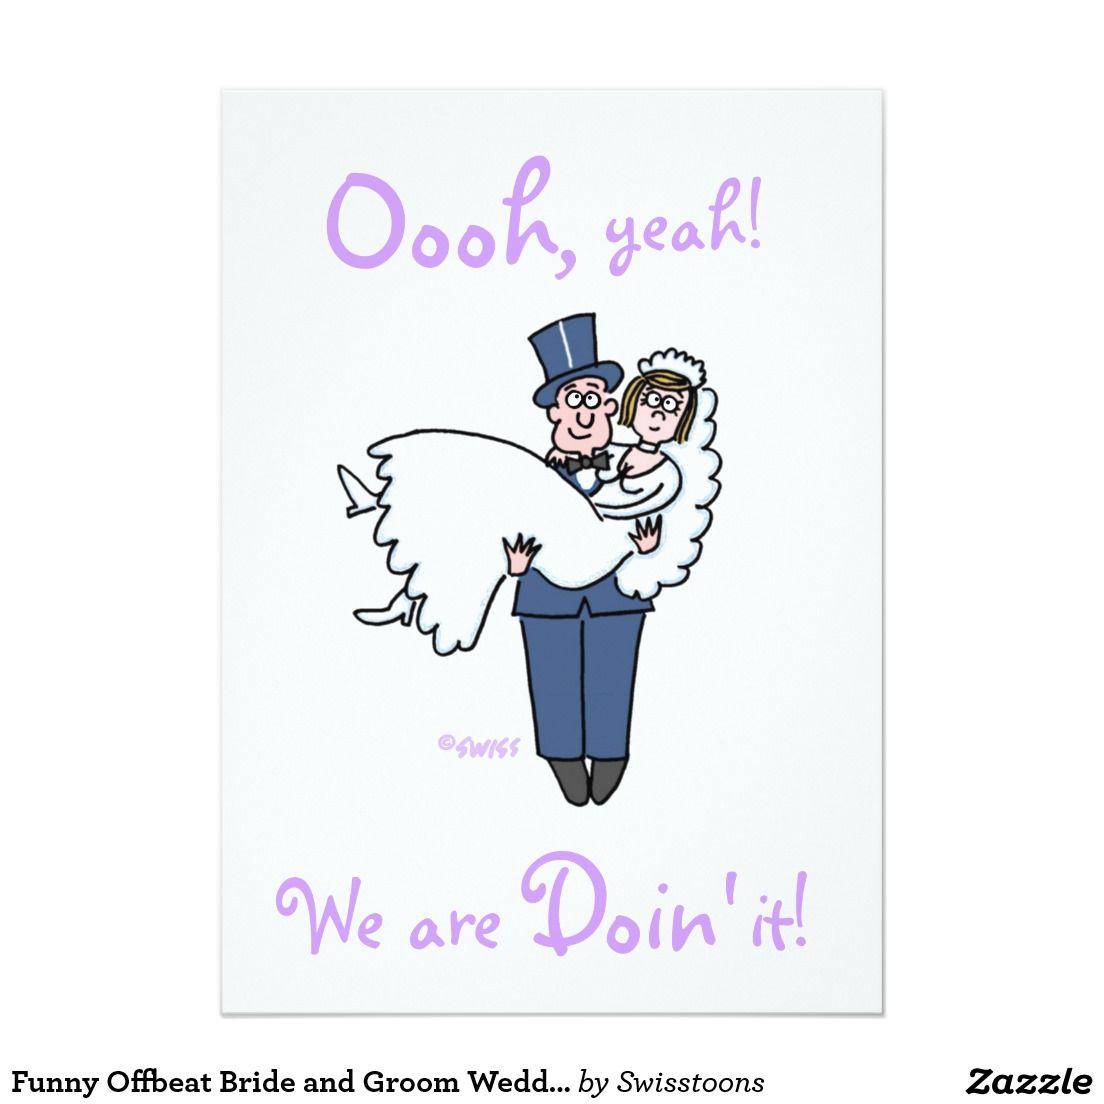 Funny Offbeat Bride and Groom Wedding Invitations | Pinterest ...